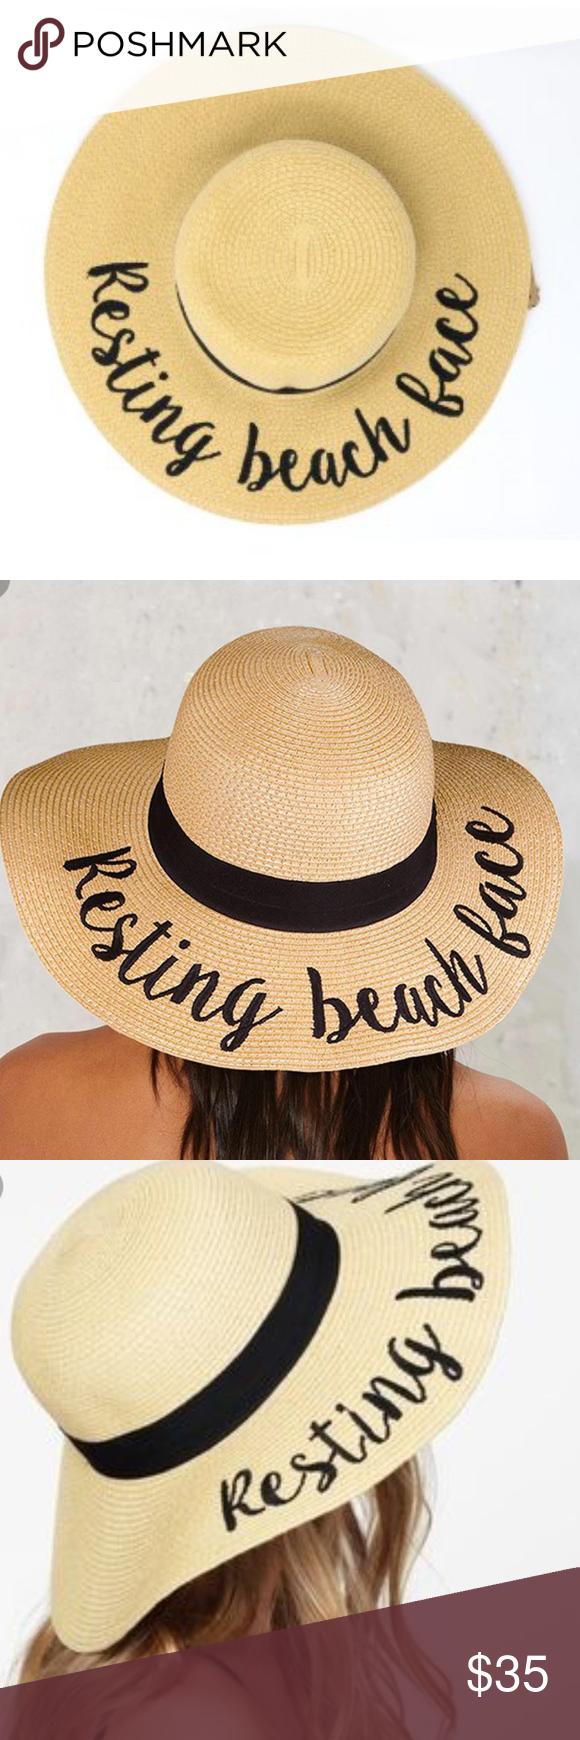 "Floppy Beach ""Resting Beach Face"" Resting Beach Face... Floppy Hat Sequined 0b0a8bba461"